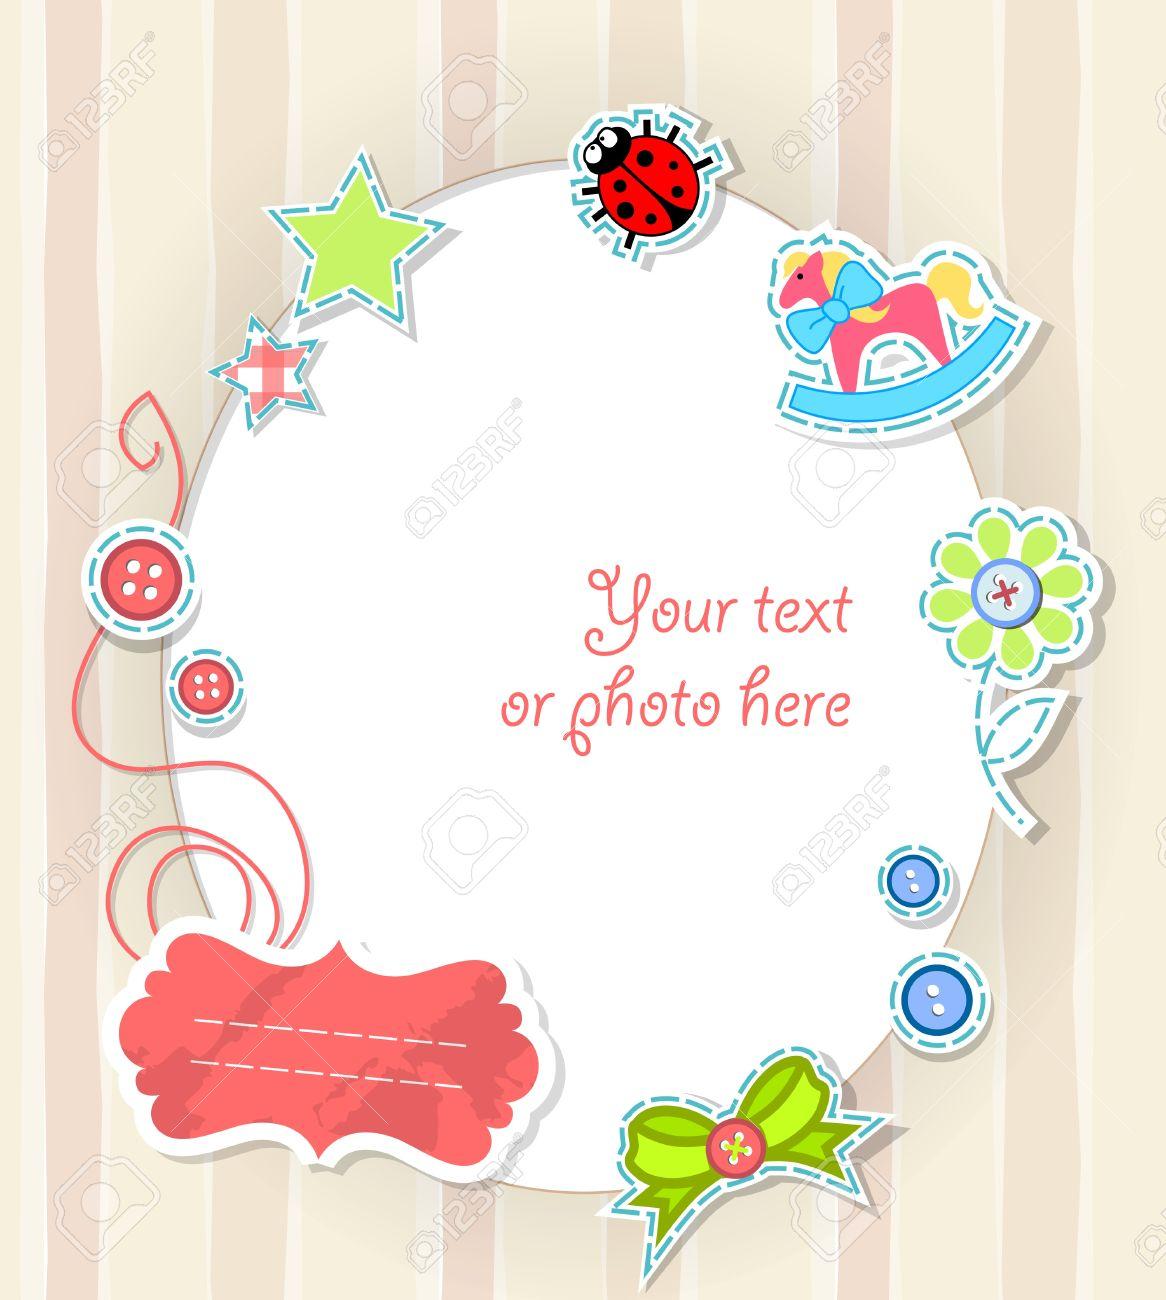 How to scrapbook greeting cards - Vector Vector Scrapbooking Card For Baby In Beige